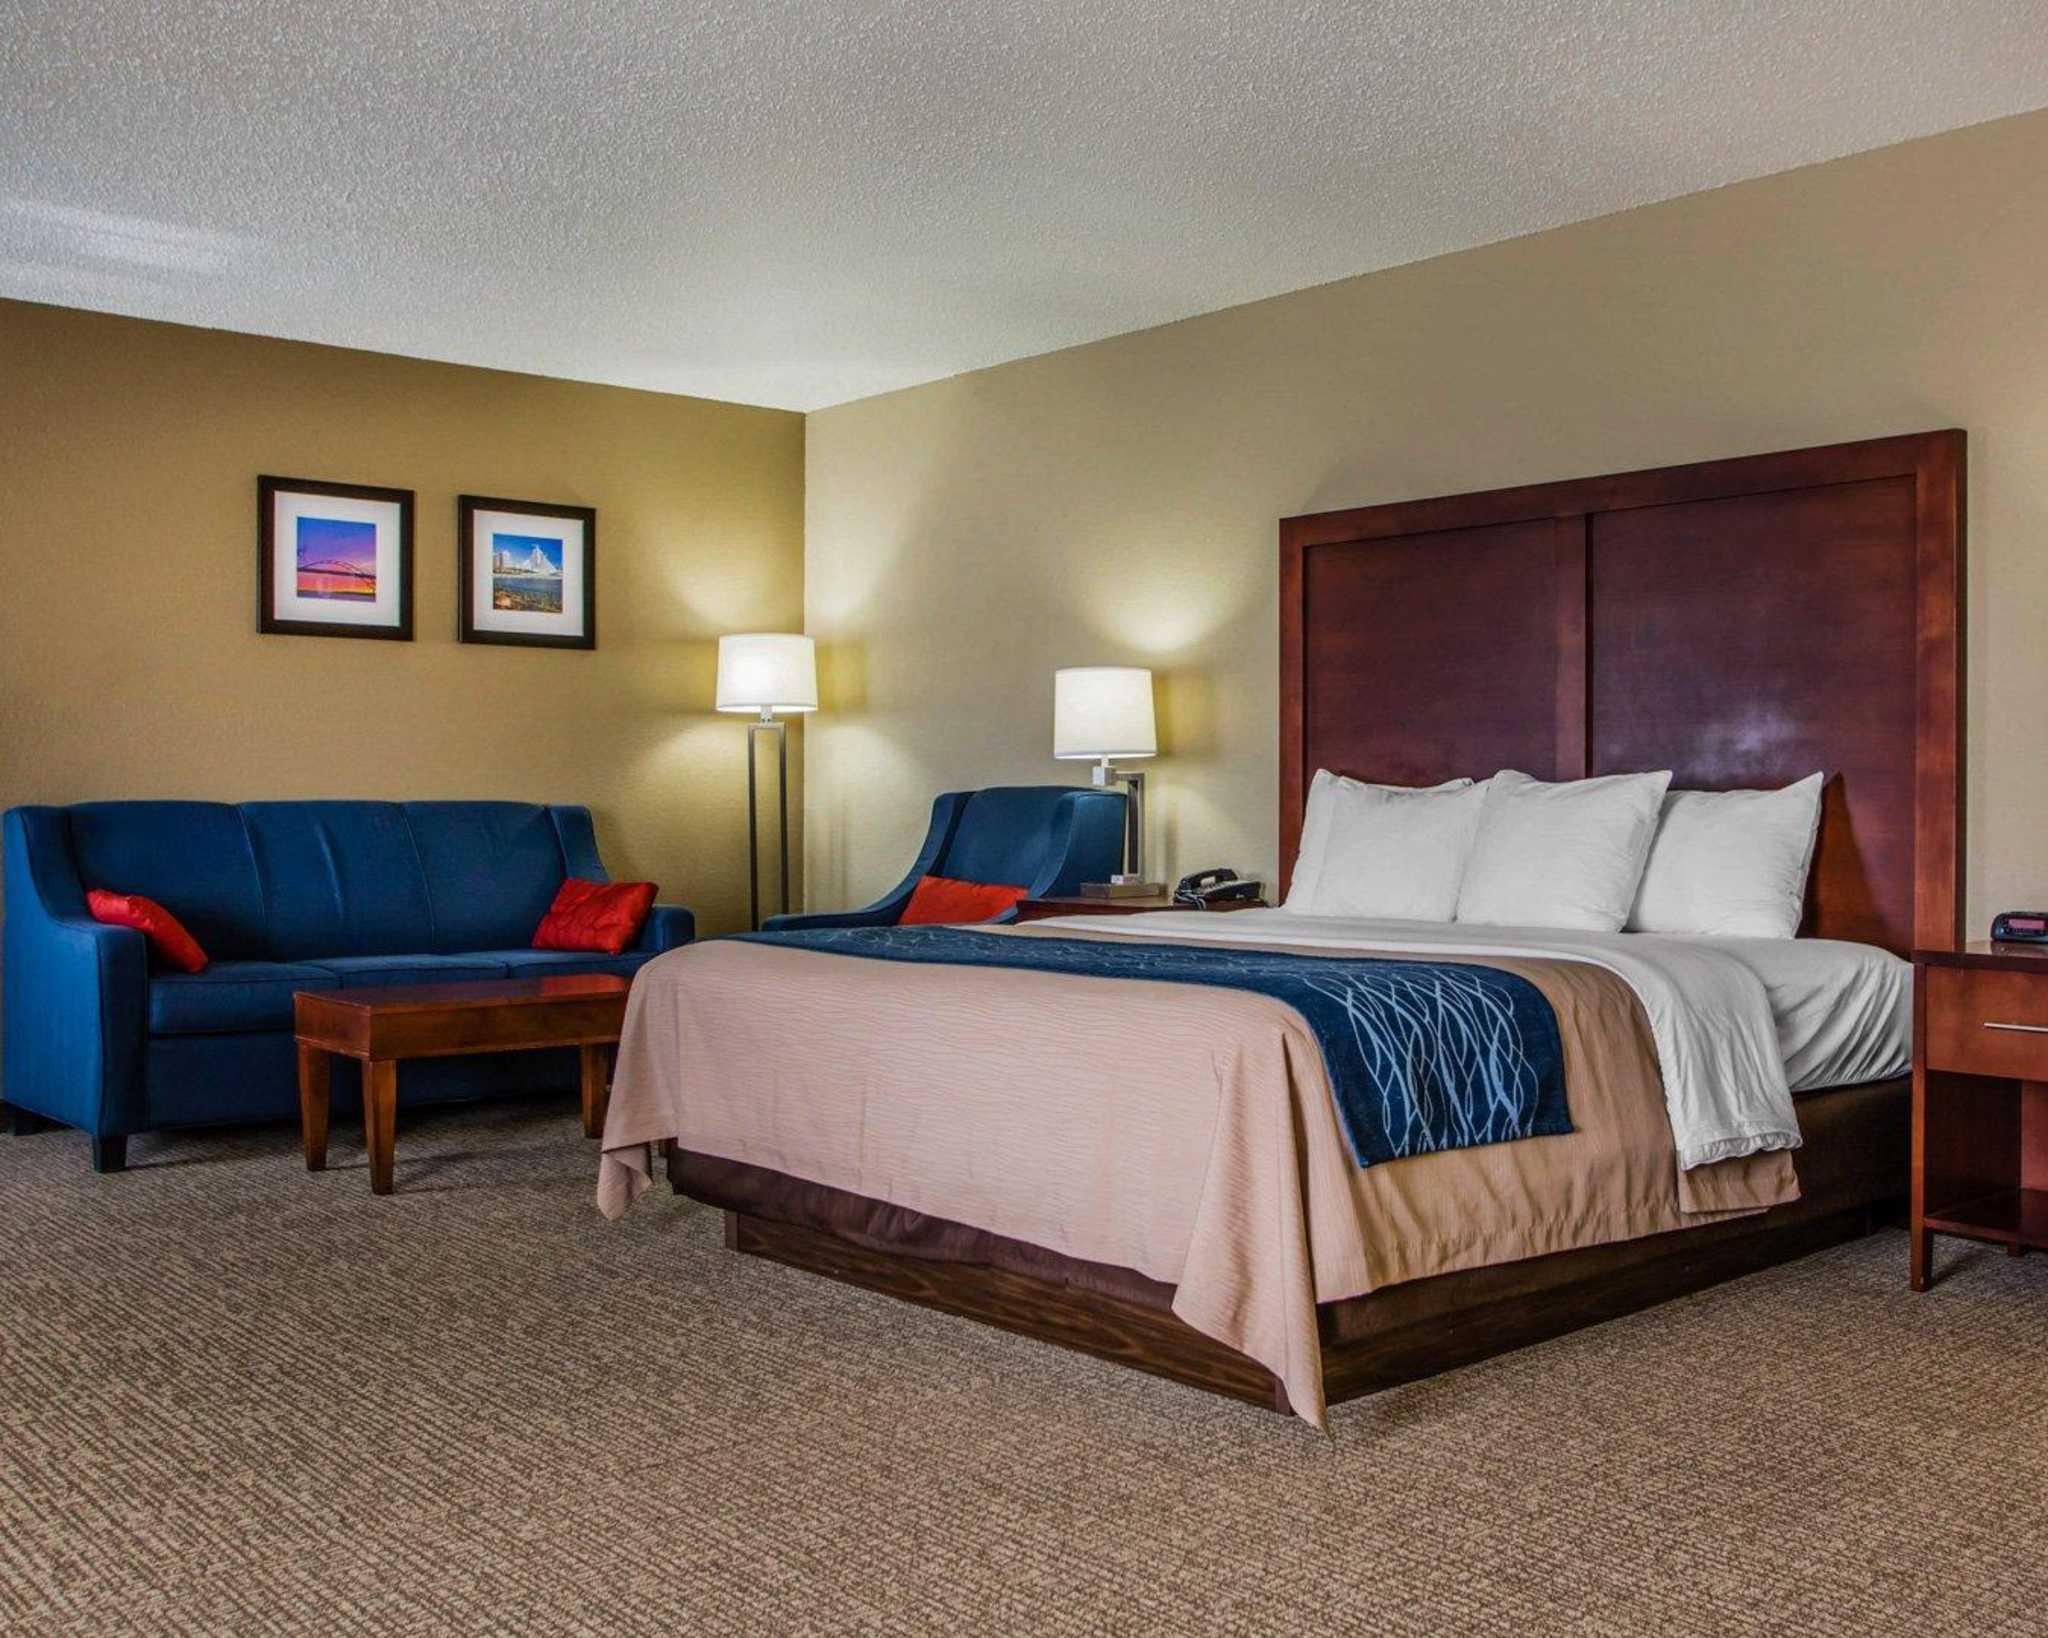 Comfort Inn & Suites Jackson - West Bend image 11